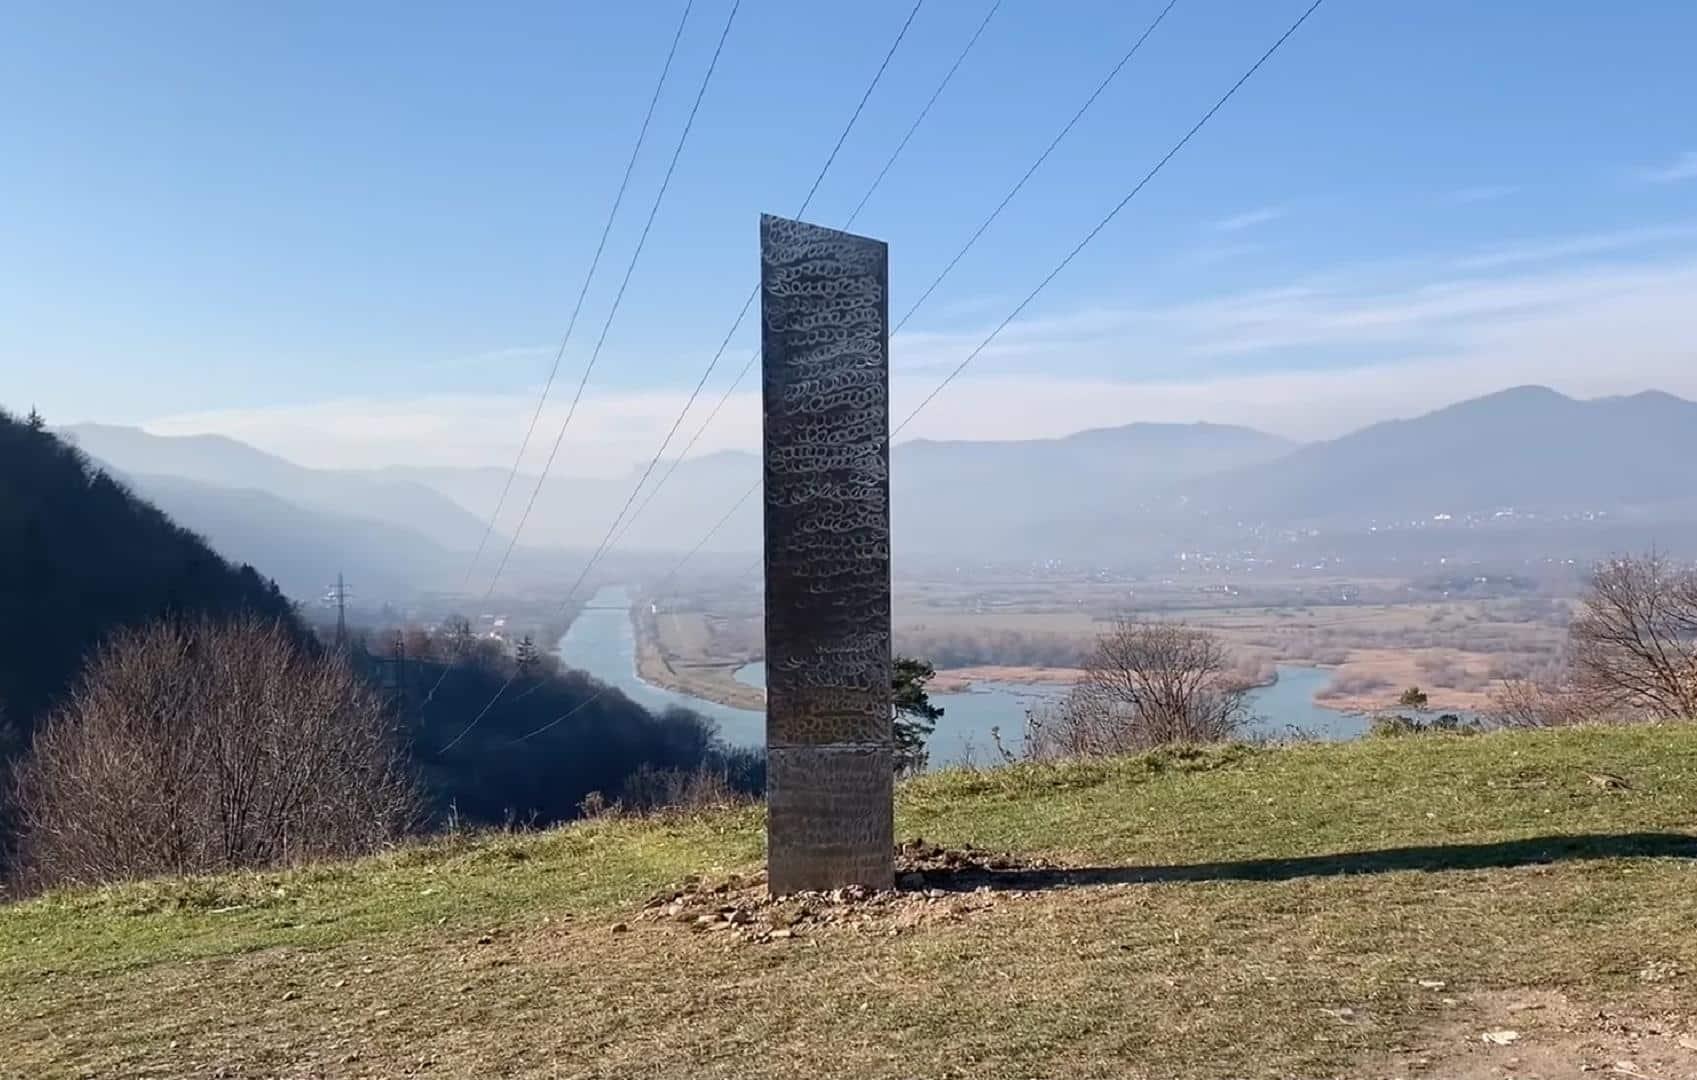 """Monólito alienígena"" de Pietra Neamt, na Romênia"